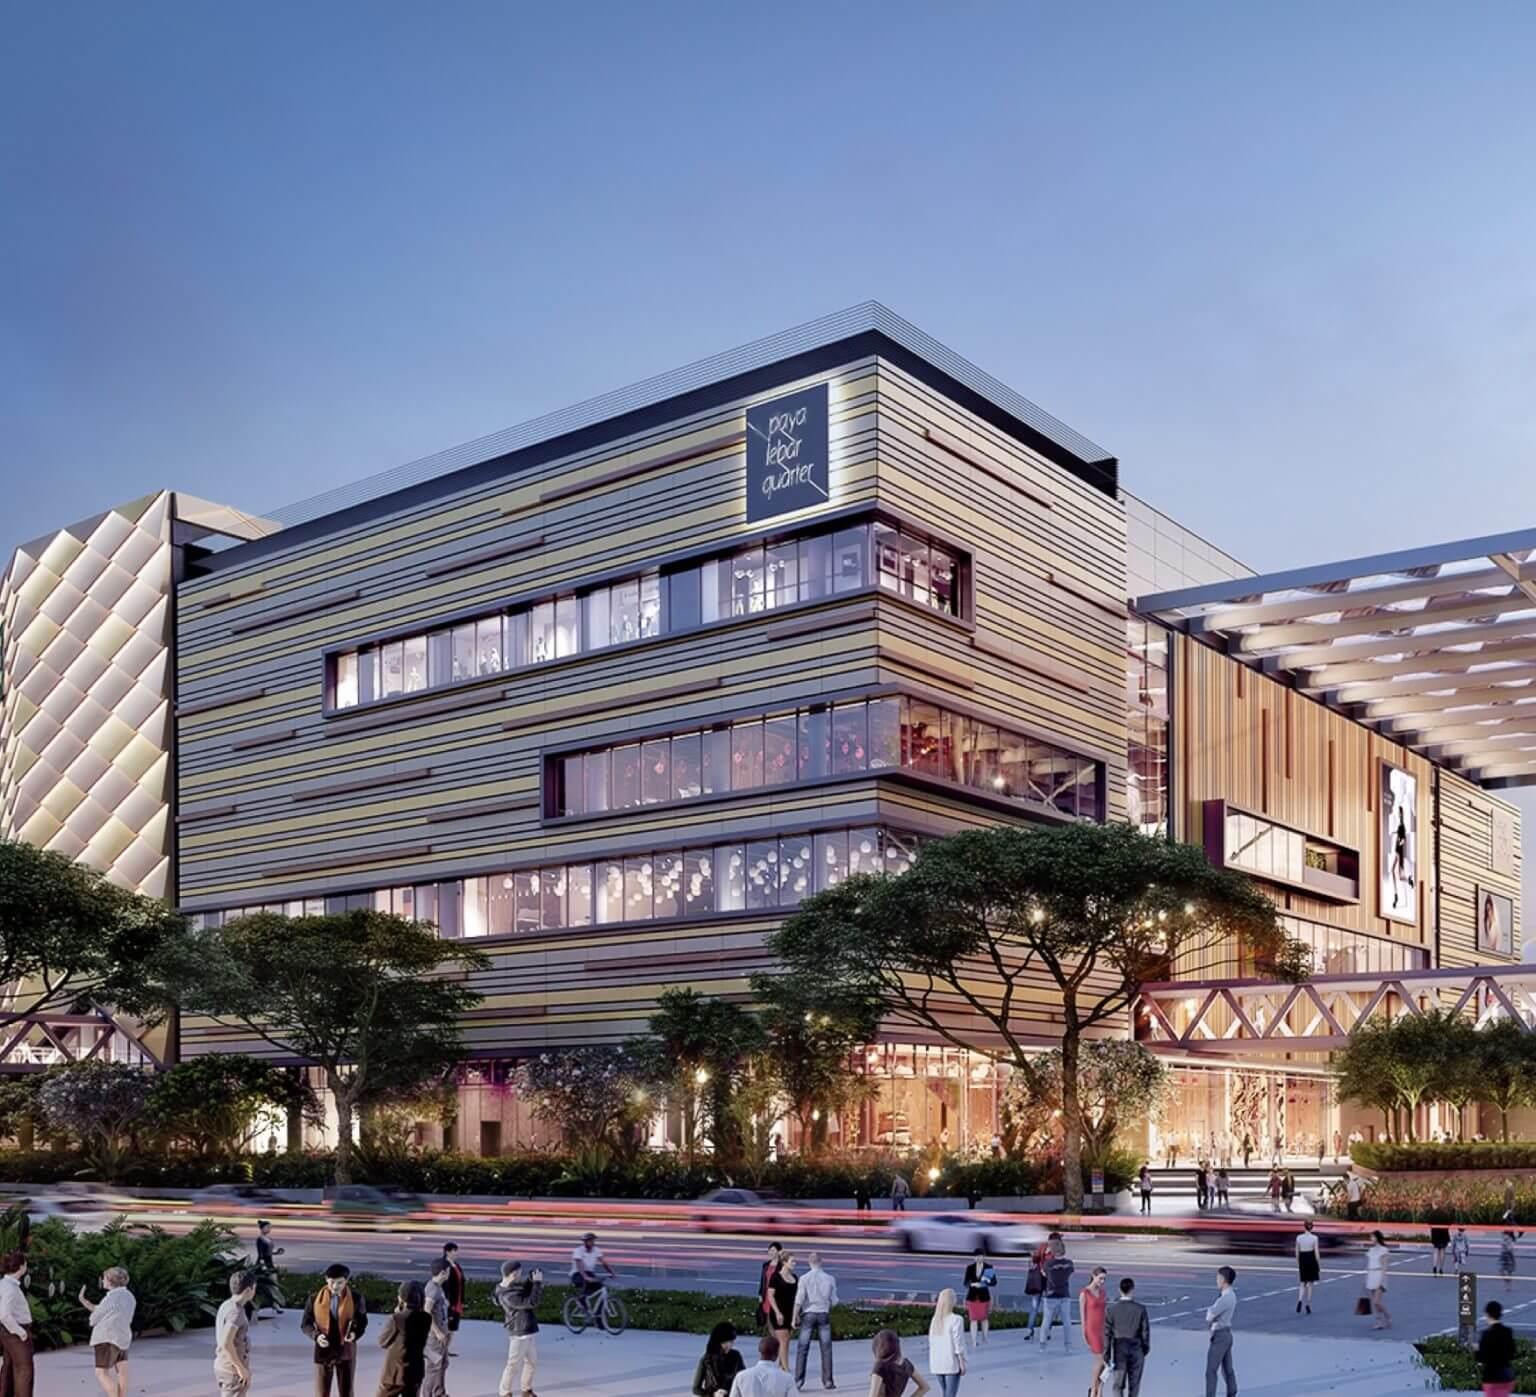 Mori Condo Paya Lebar Square shopping mall